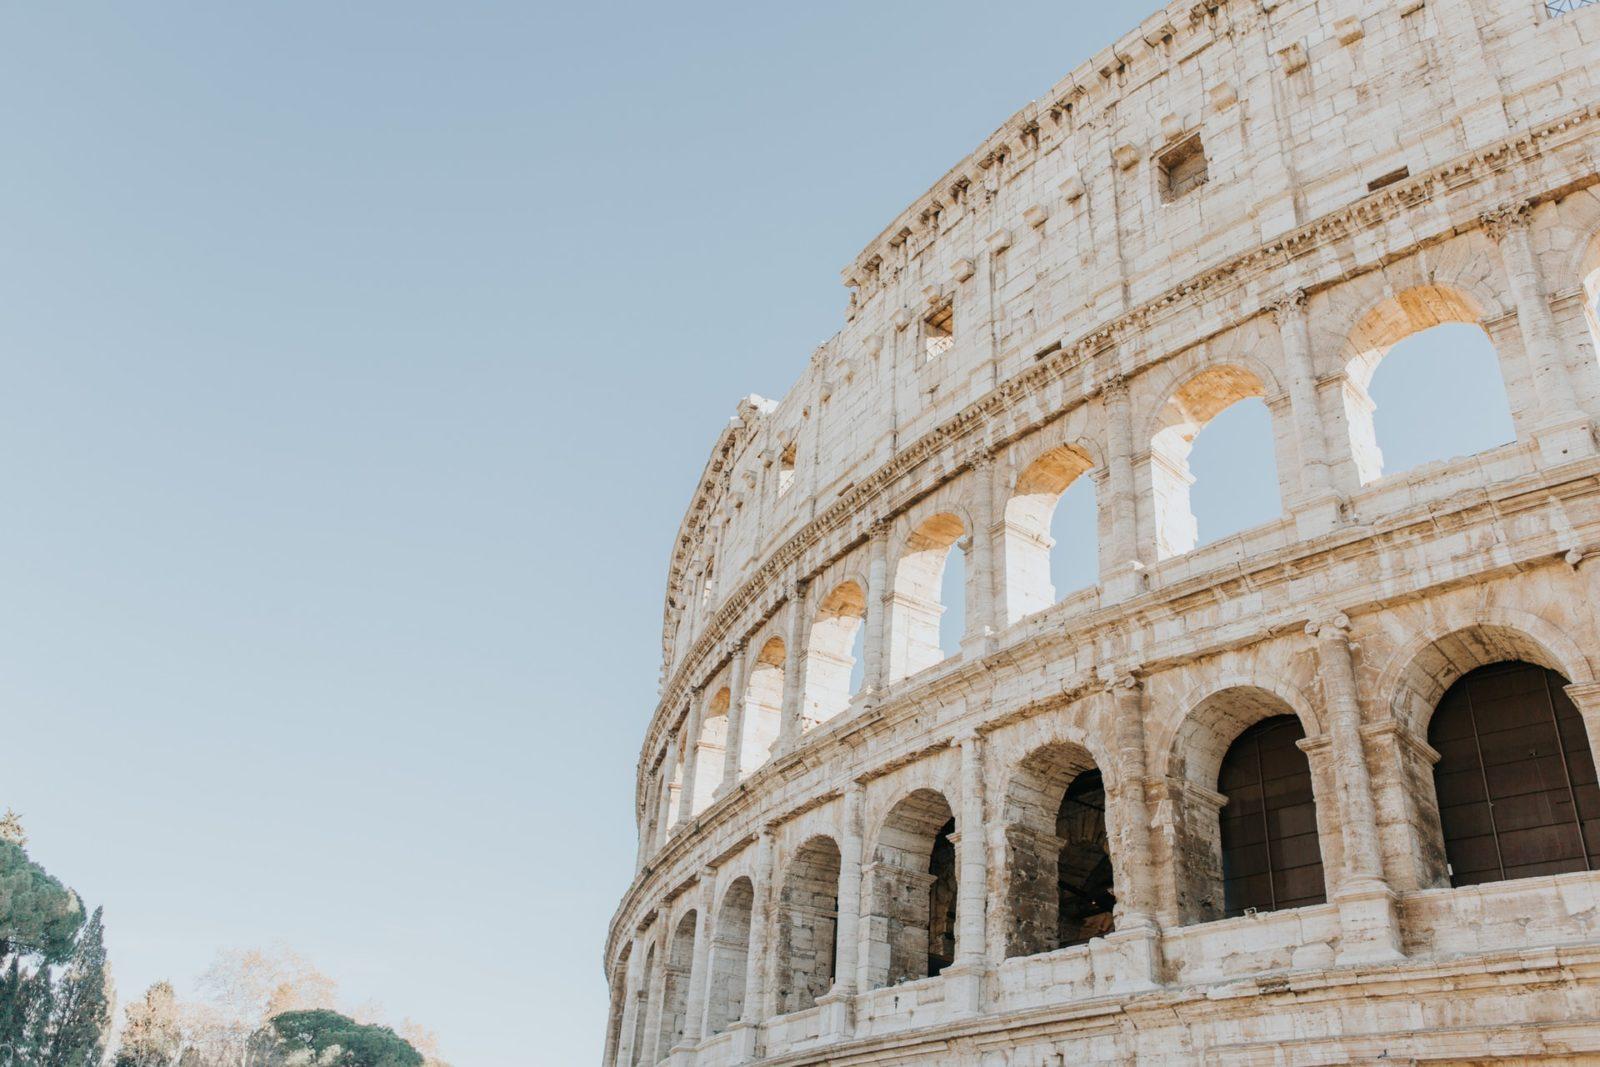 Нужна ли страховка при путешествии в Италию?